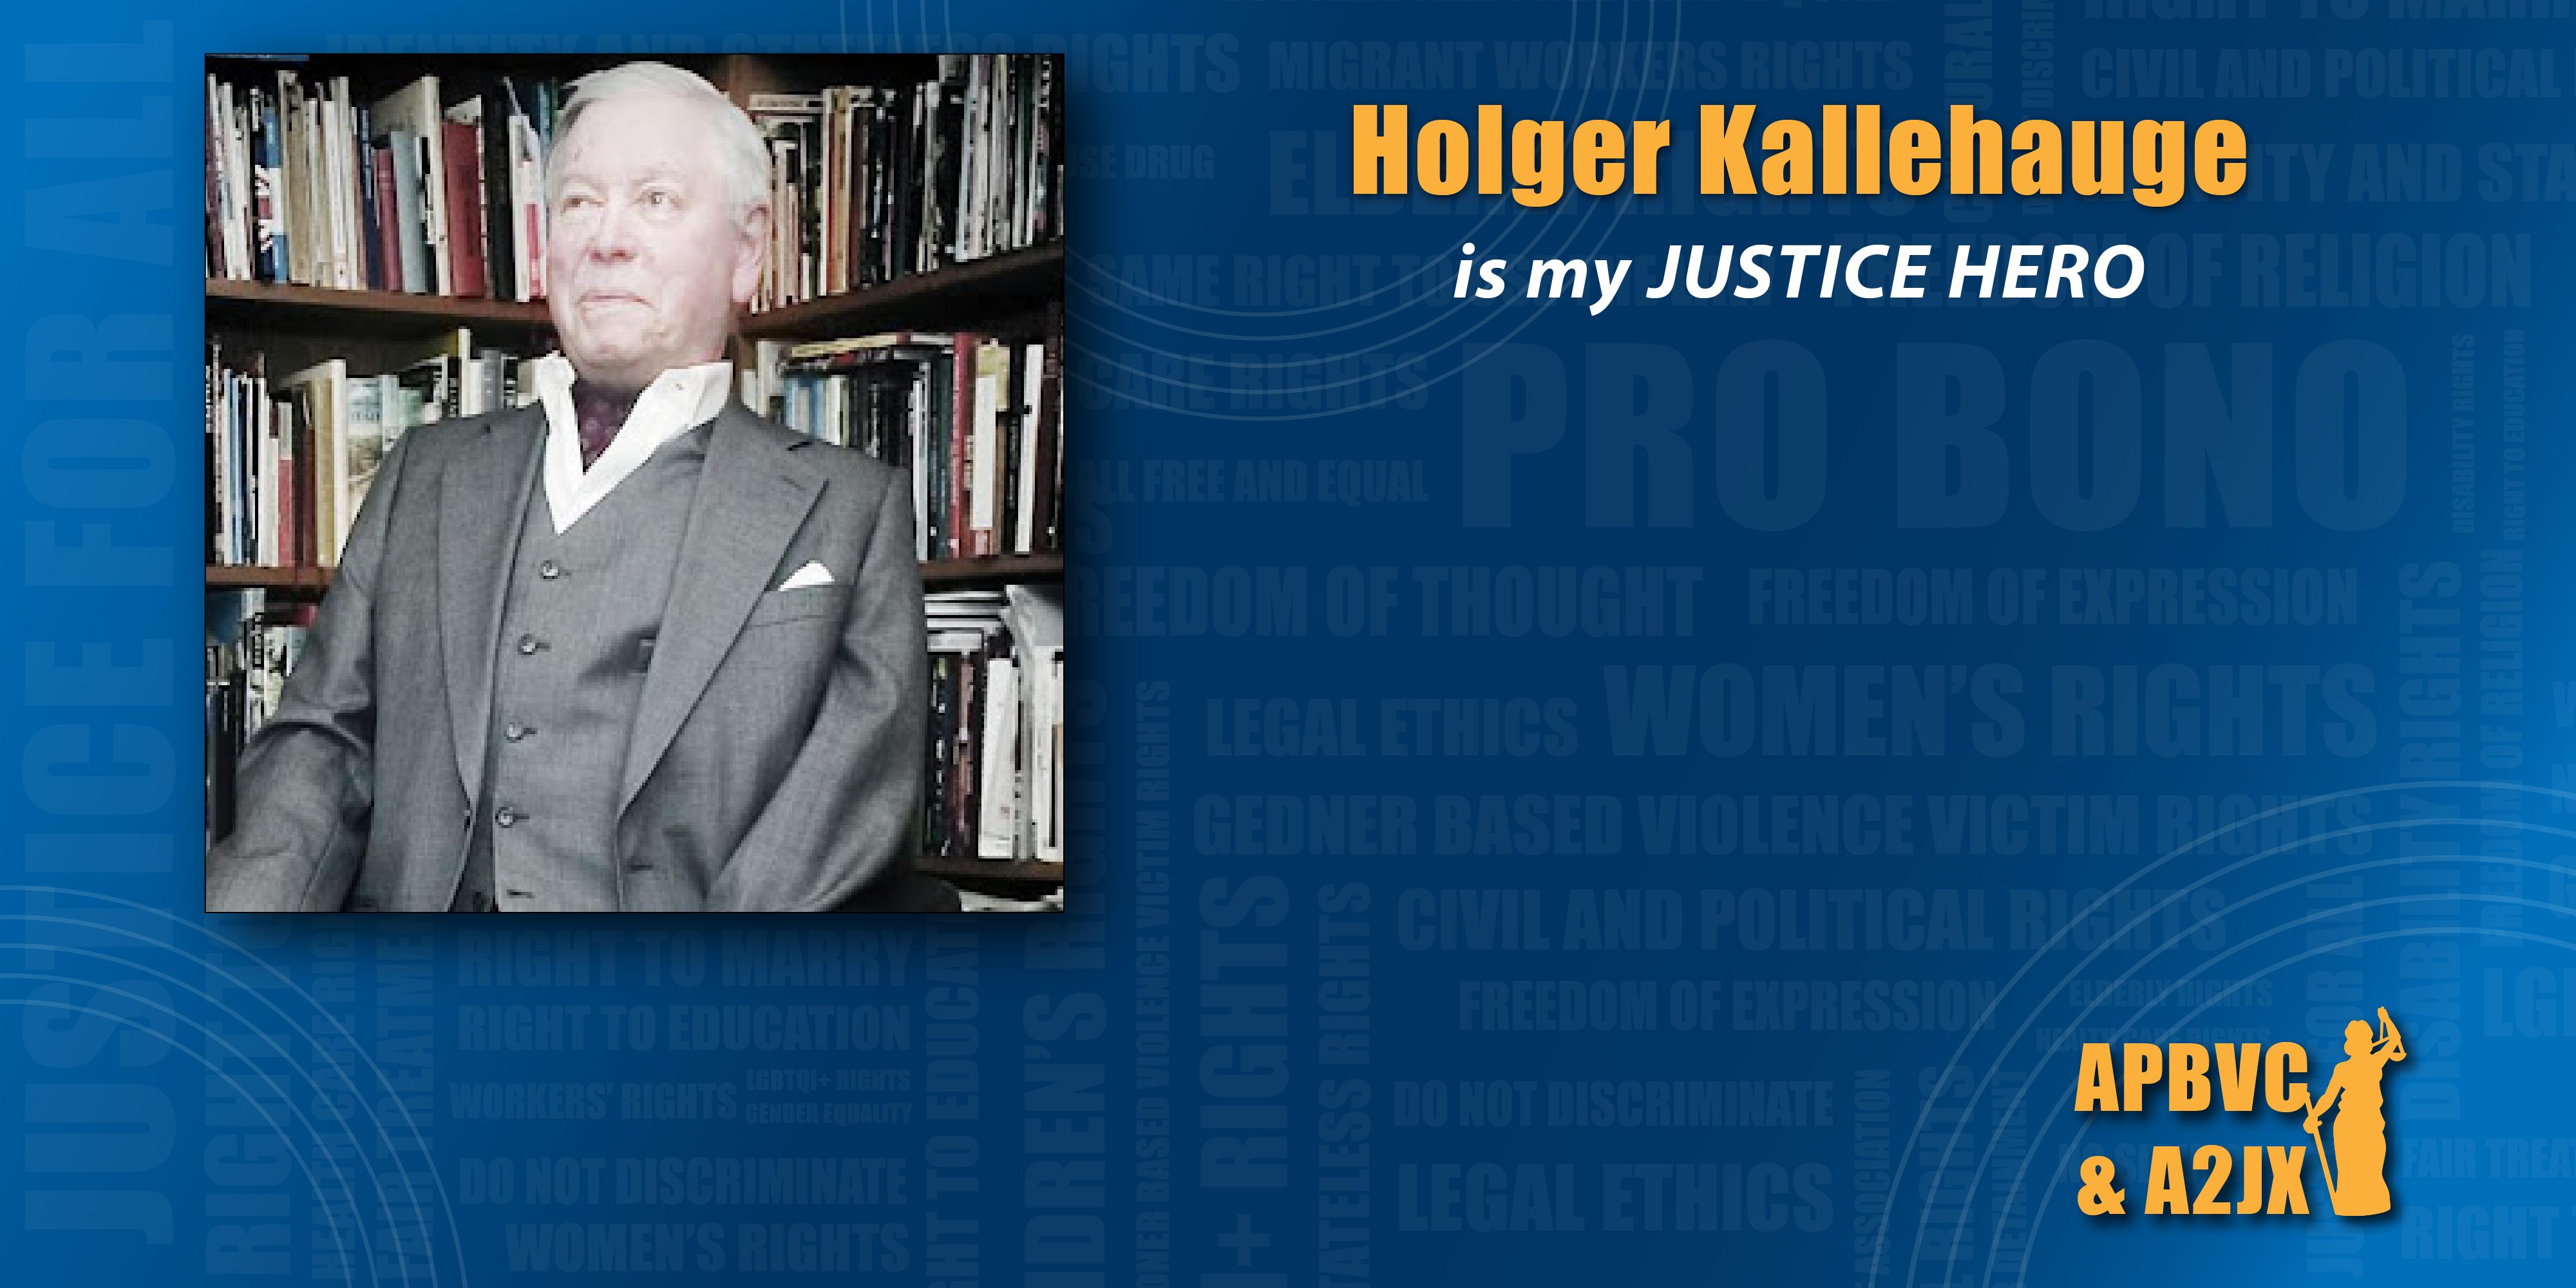 Holger Kallehauge